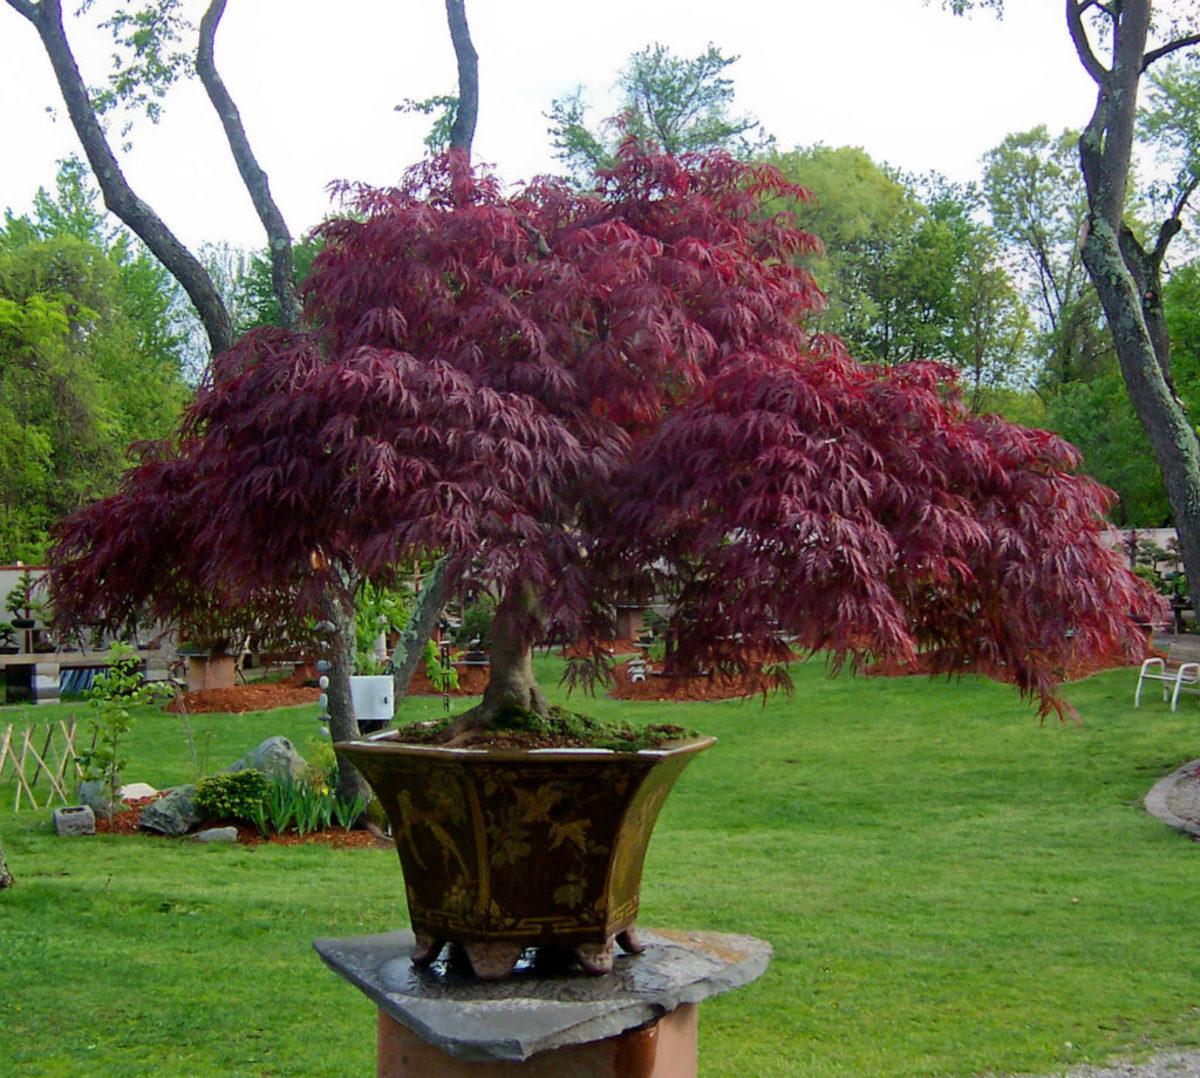 growing trees in pots